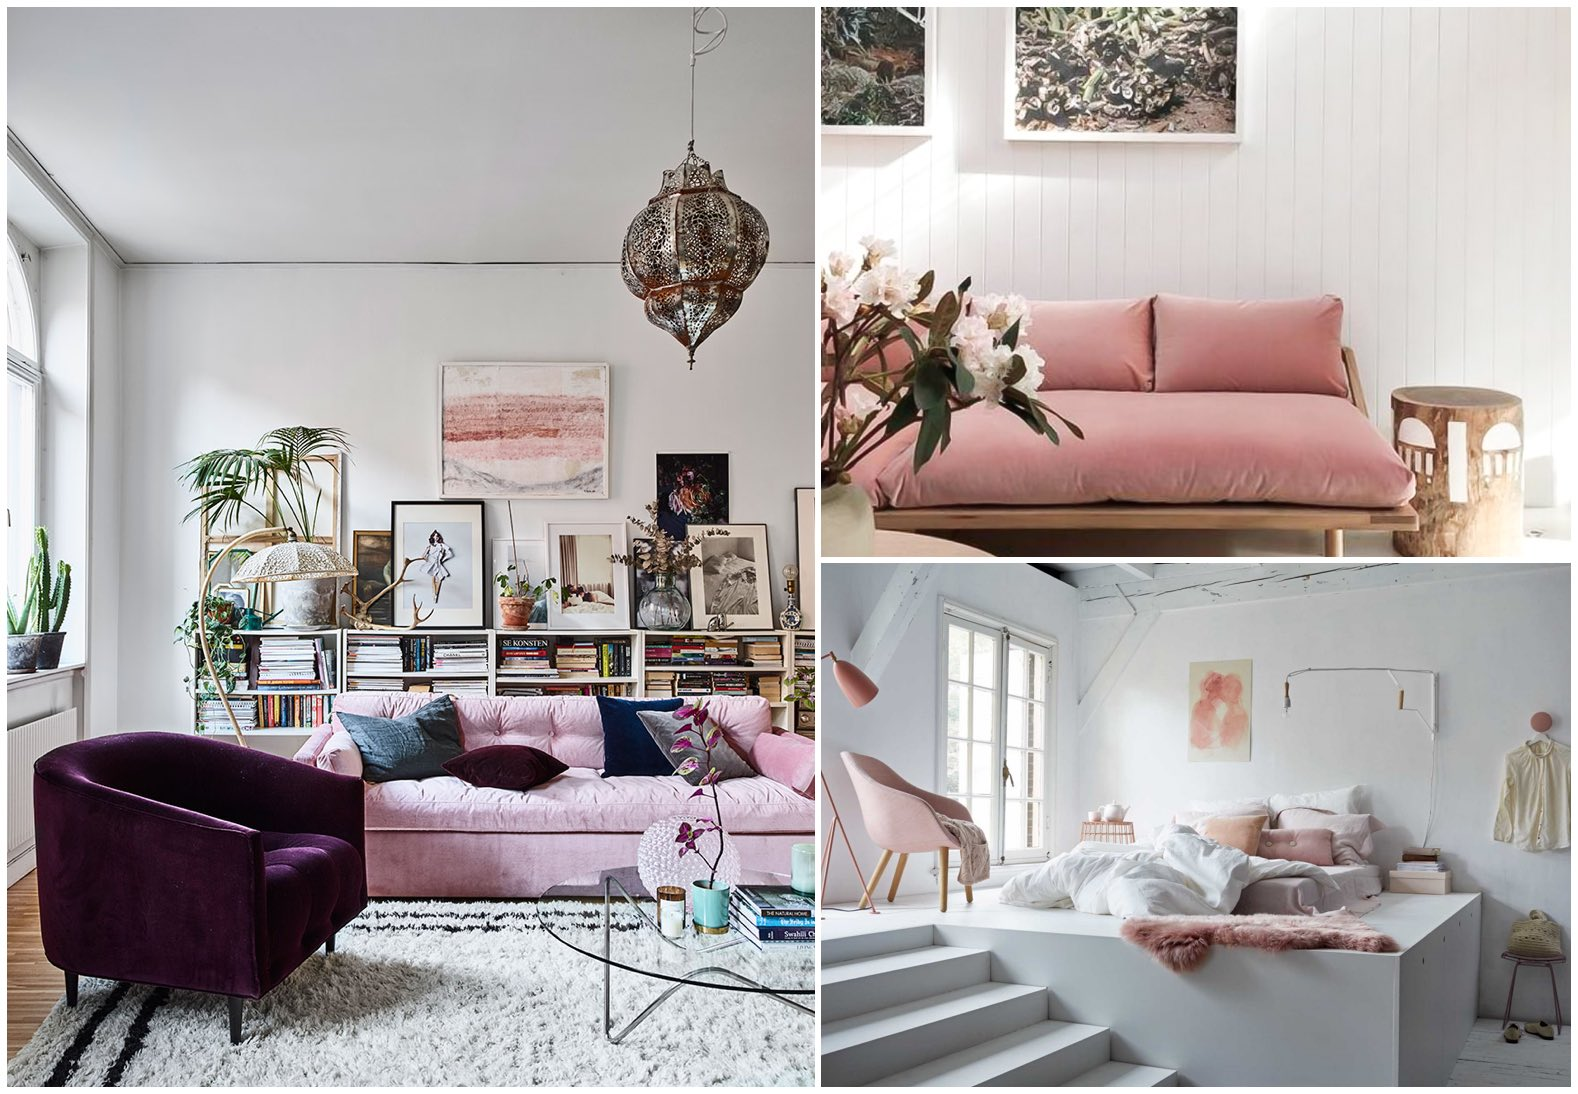 Velvet in interior design modern interior design with velvet furniture or home decorations